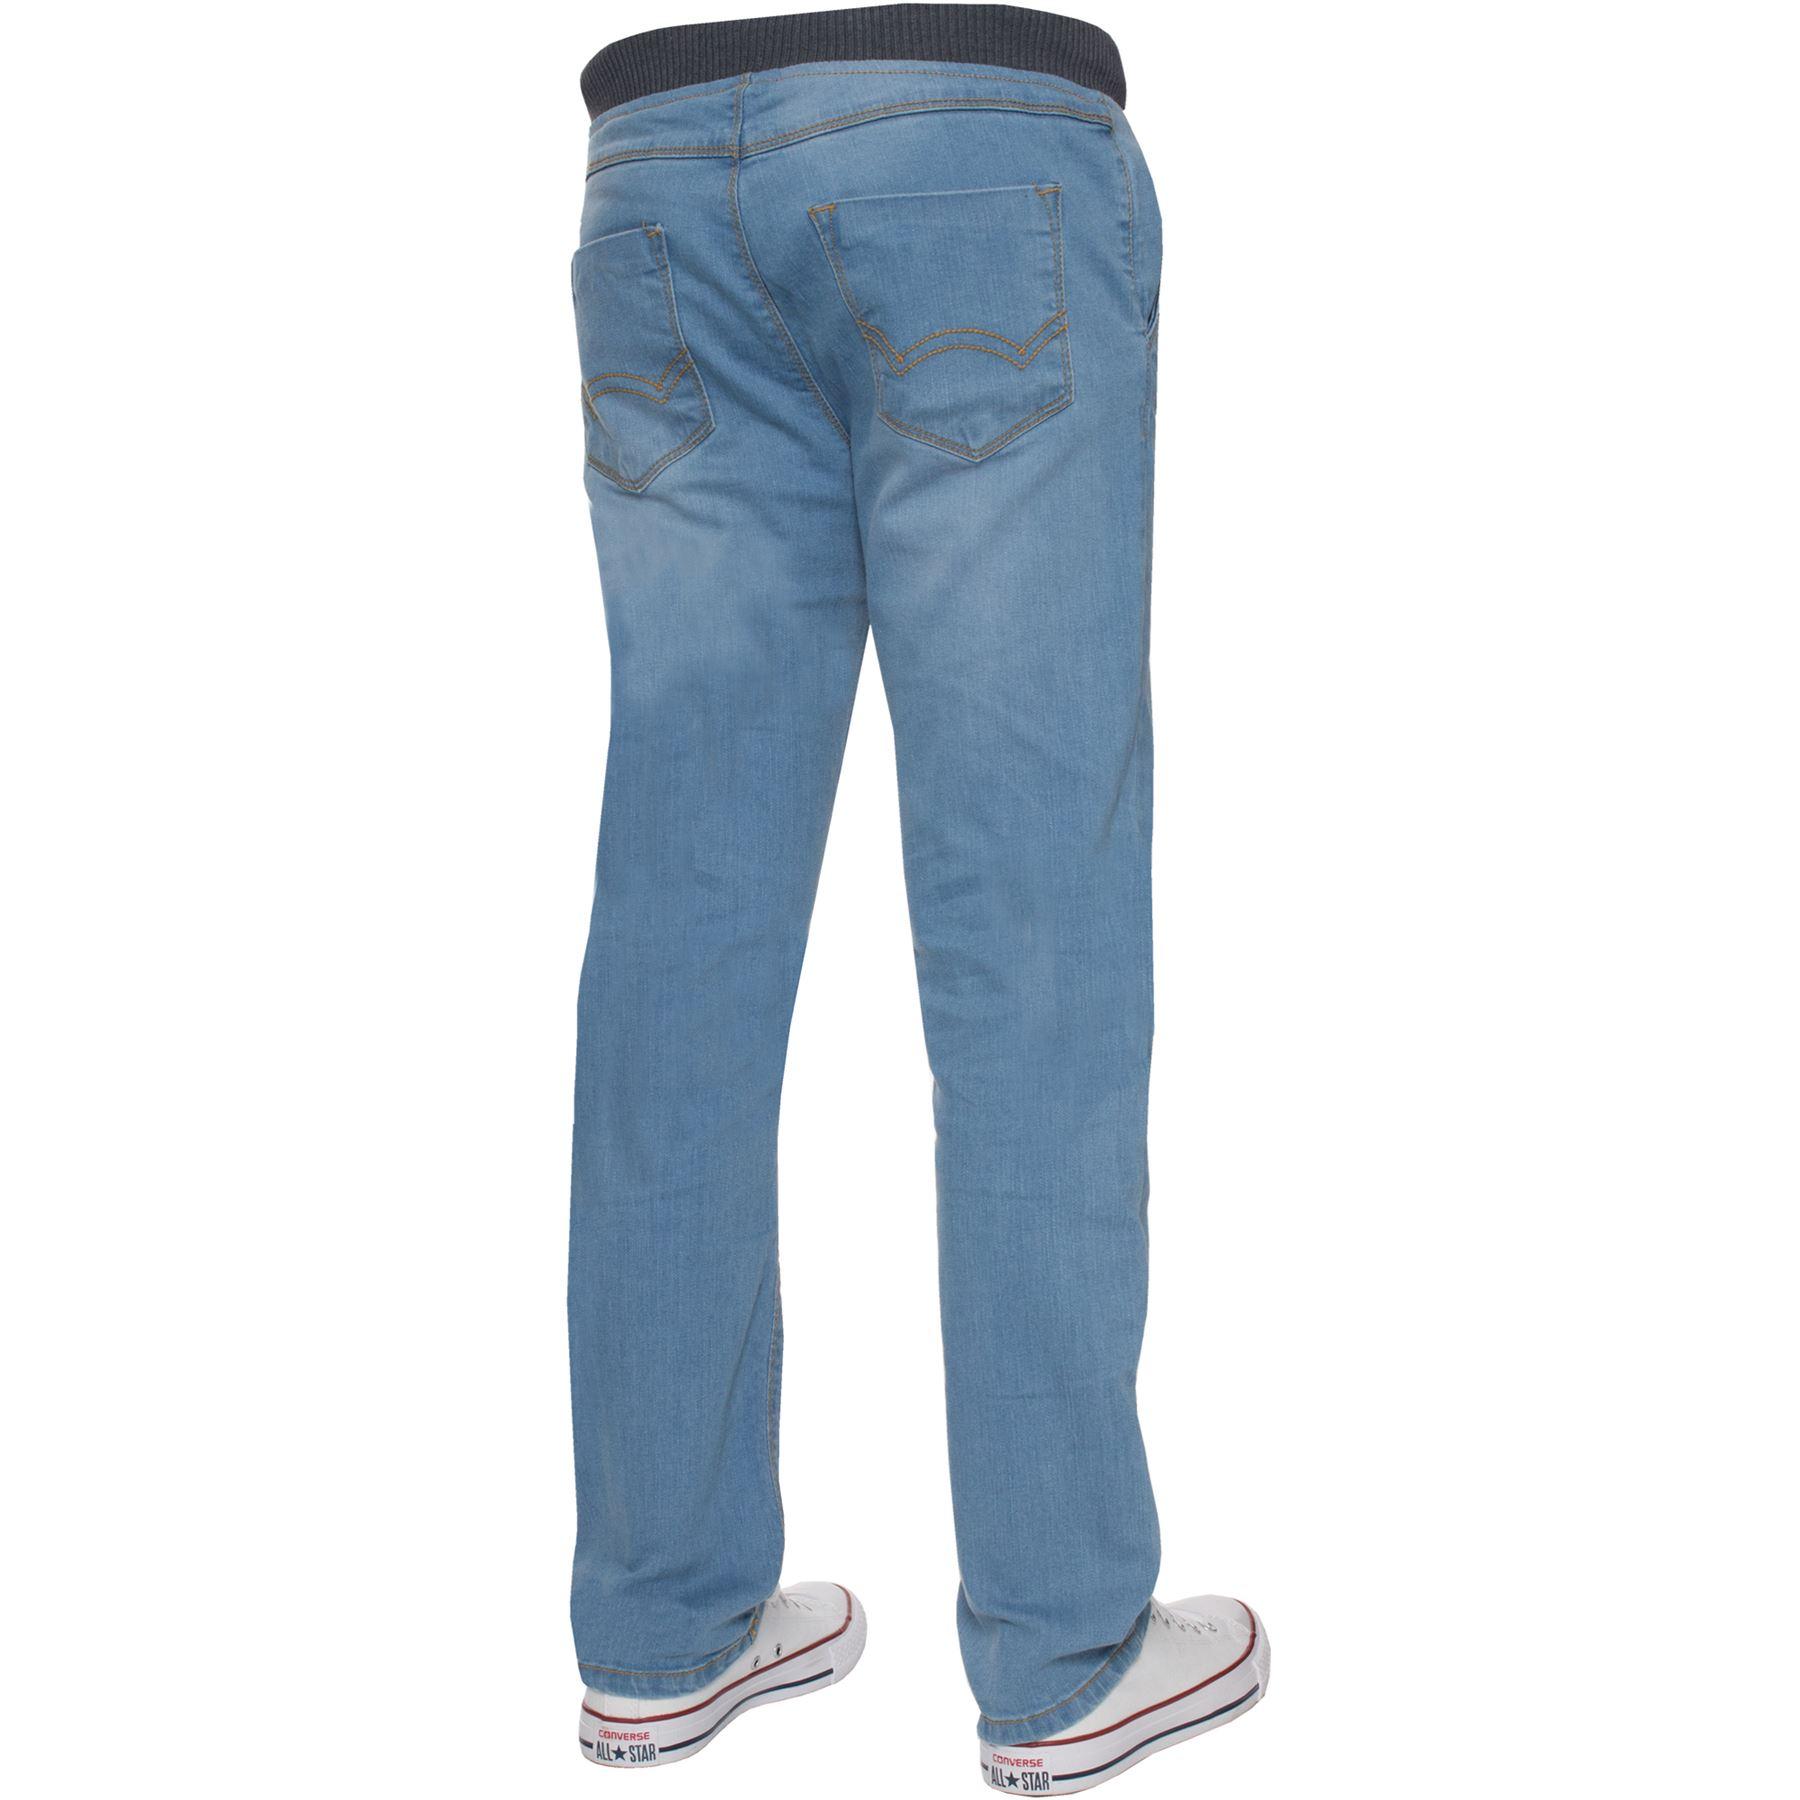 Jean-Garcon-Taille-Elastique-Enfants-Skinny-Stretch-School-Denim-Pantalon-Pantalon miniature 13